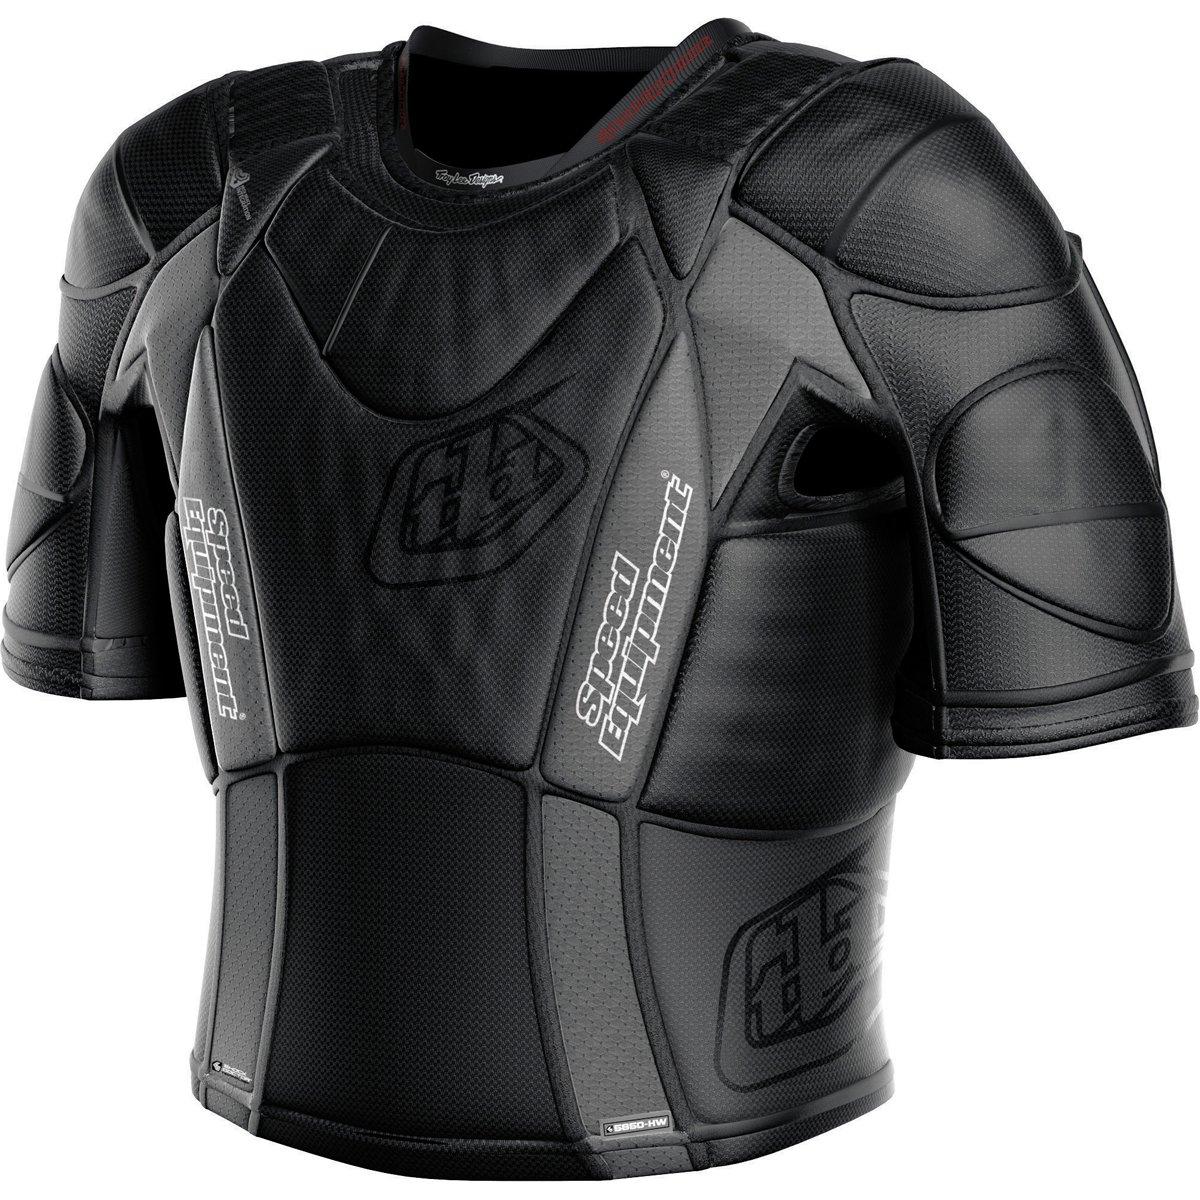 Troy Lee Designs UPS 5850 HW Adult Undergarment Off-Road Shirts, MediumBlack